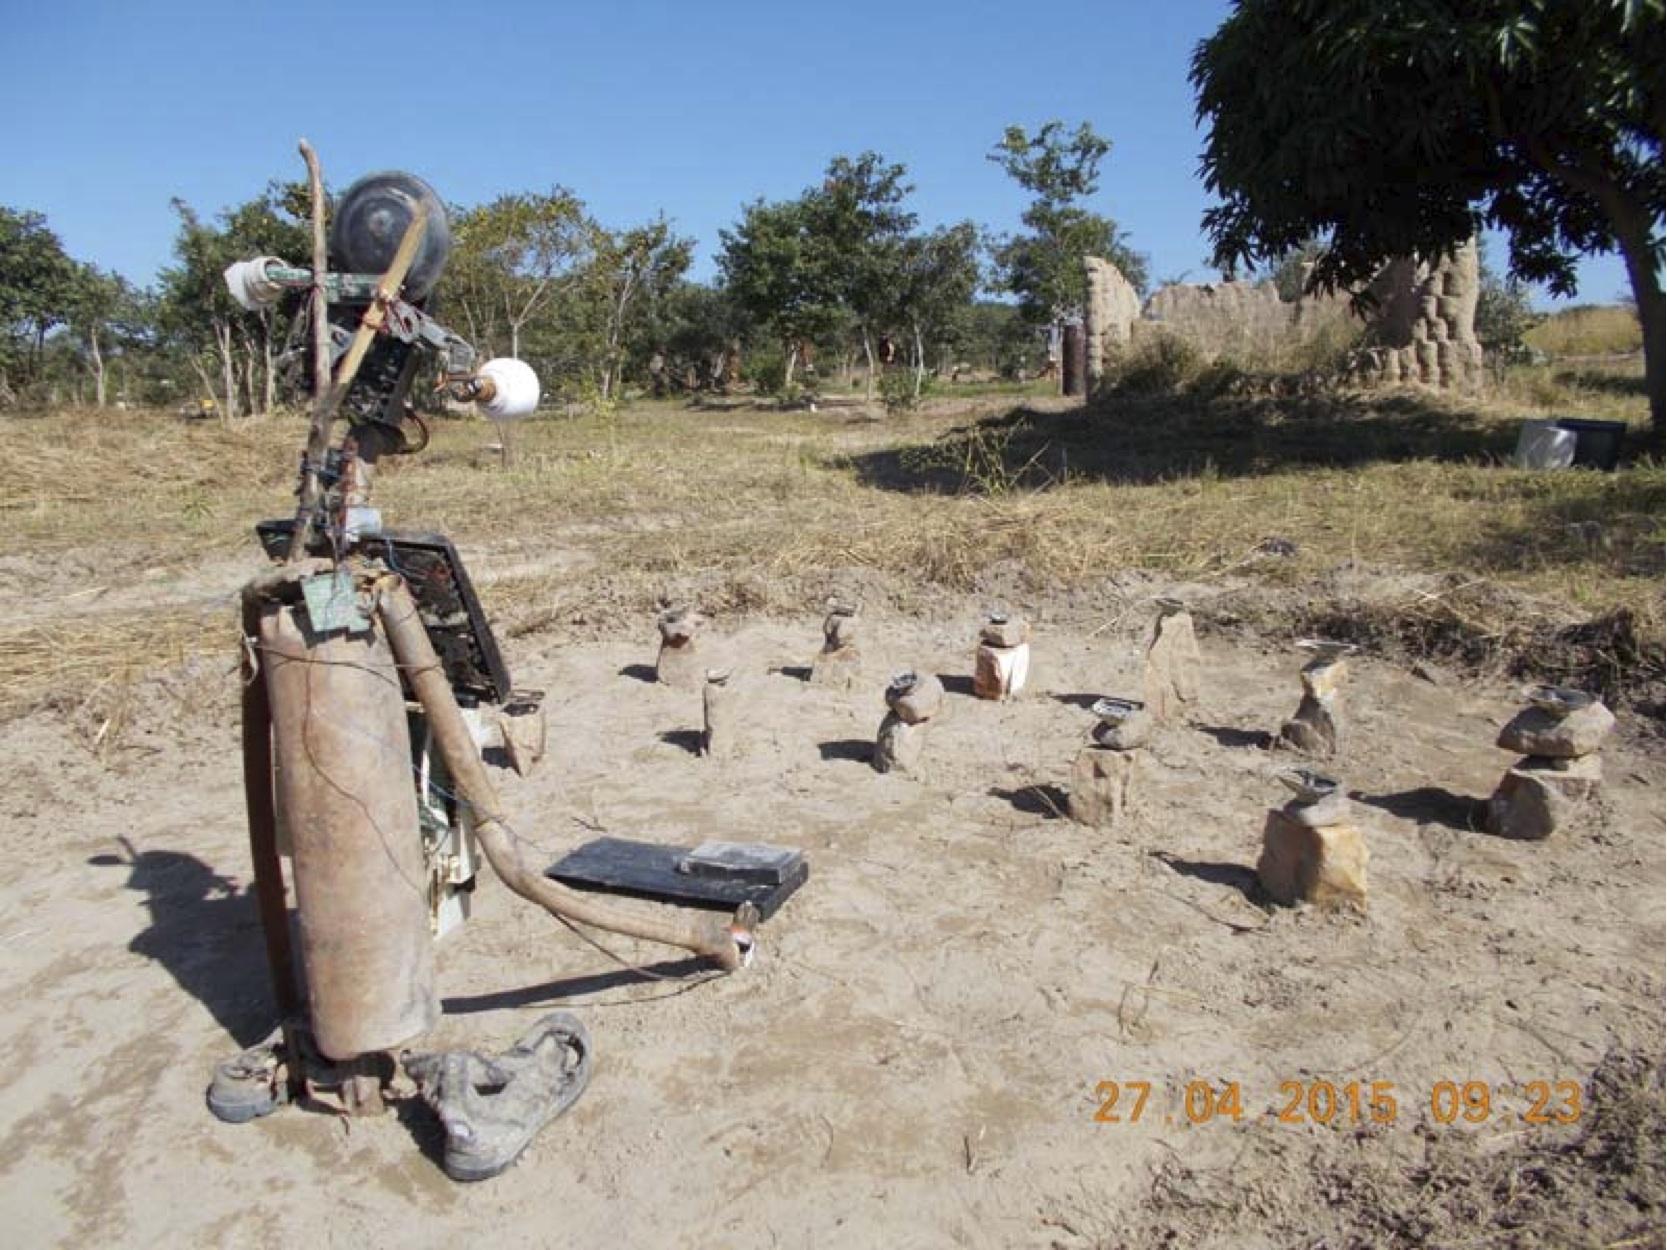 Munandi Art Studio and the Harvesting workshop in Shiyala, Zambia